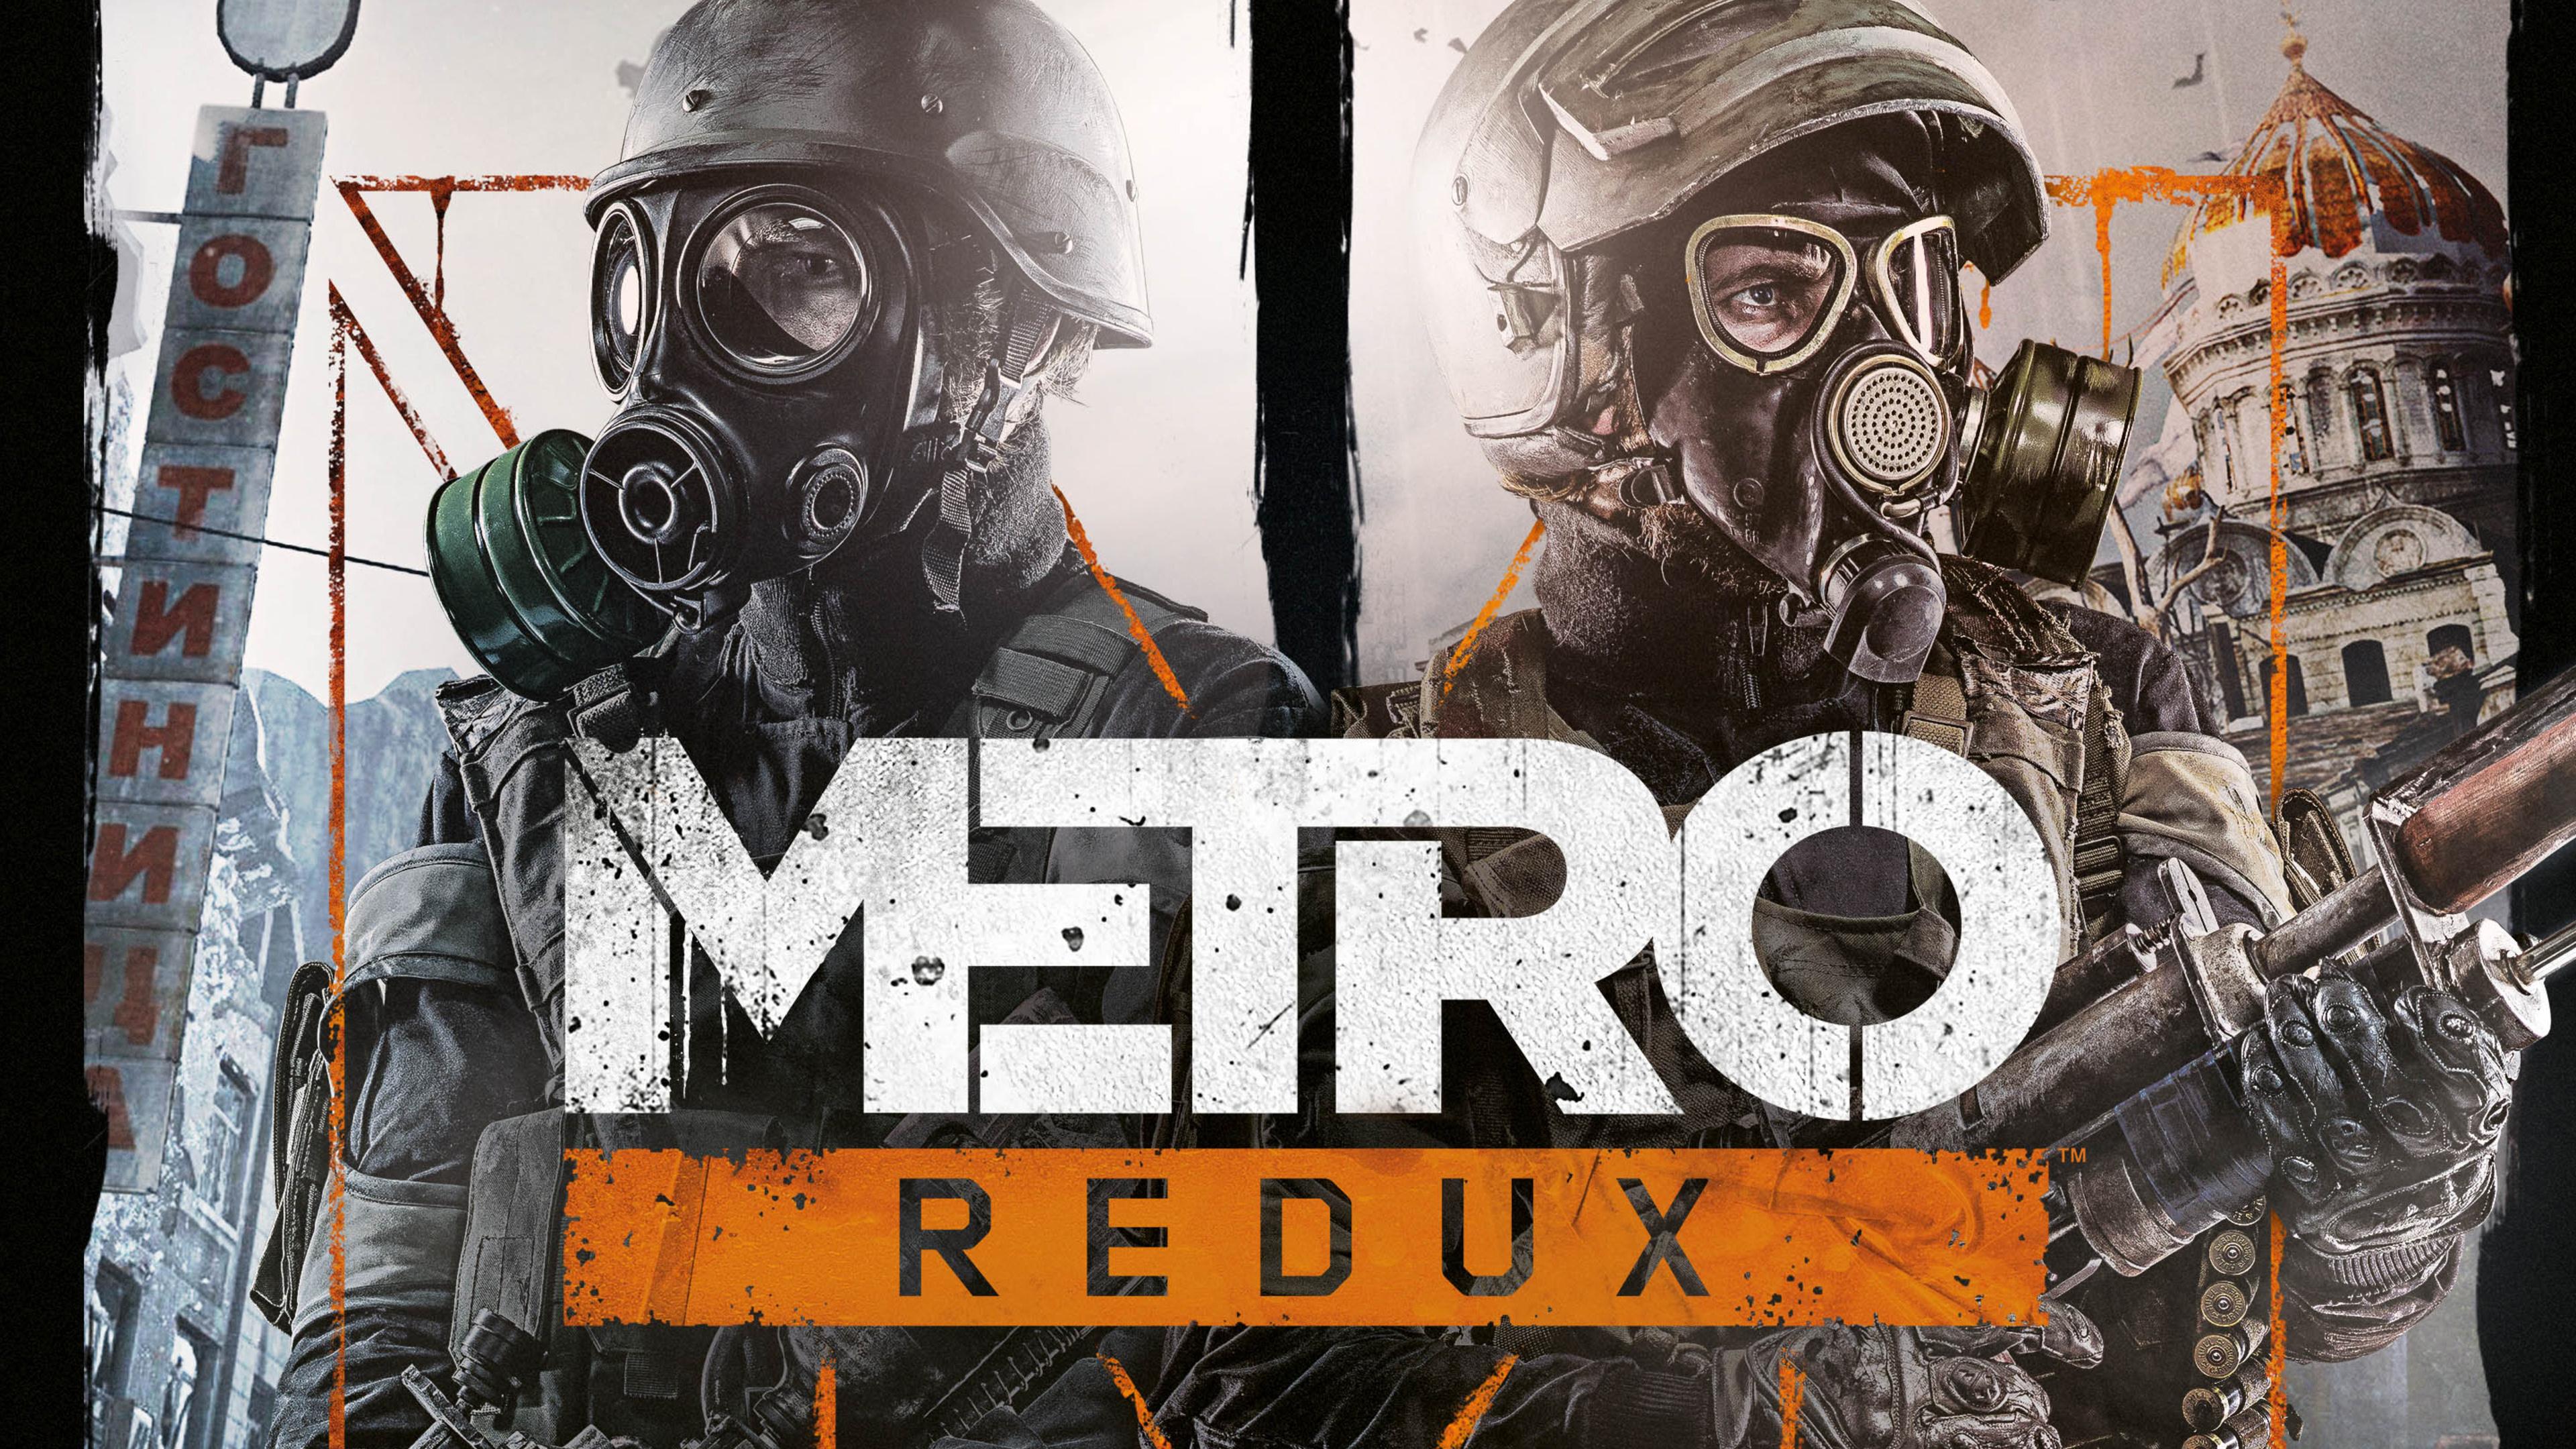 metro 2033 redux 1535967055 - Metro 2033 Redux - xbox games wallpapers, ps games wallpapers, pc games wallpapers, metro 2033 redux wallpapers, games wallpapers